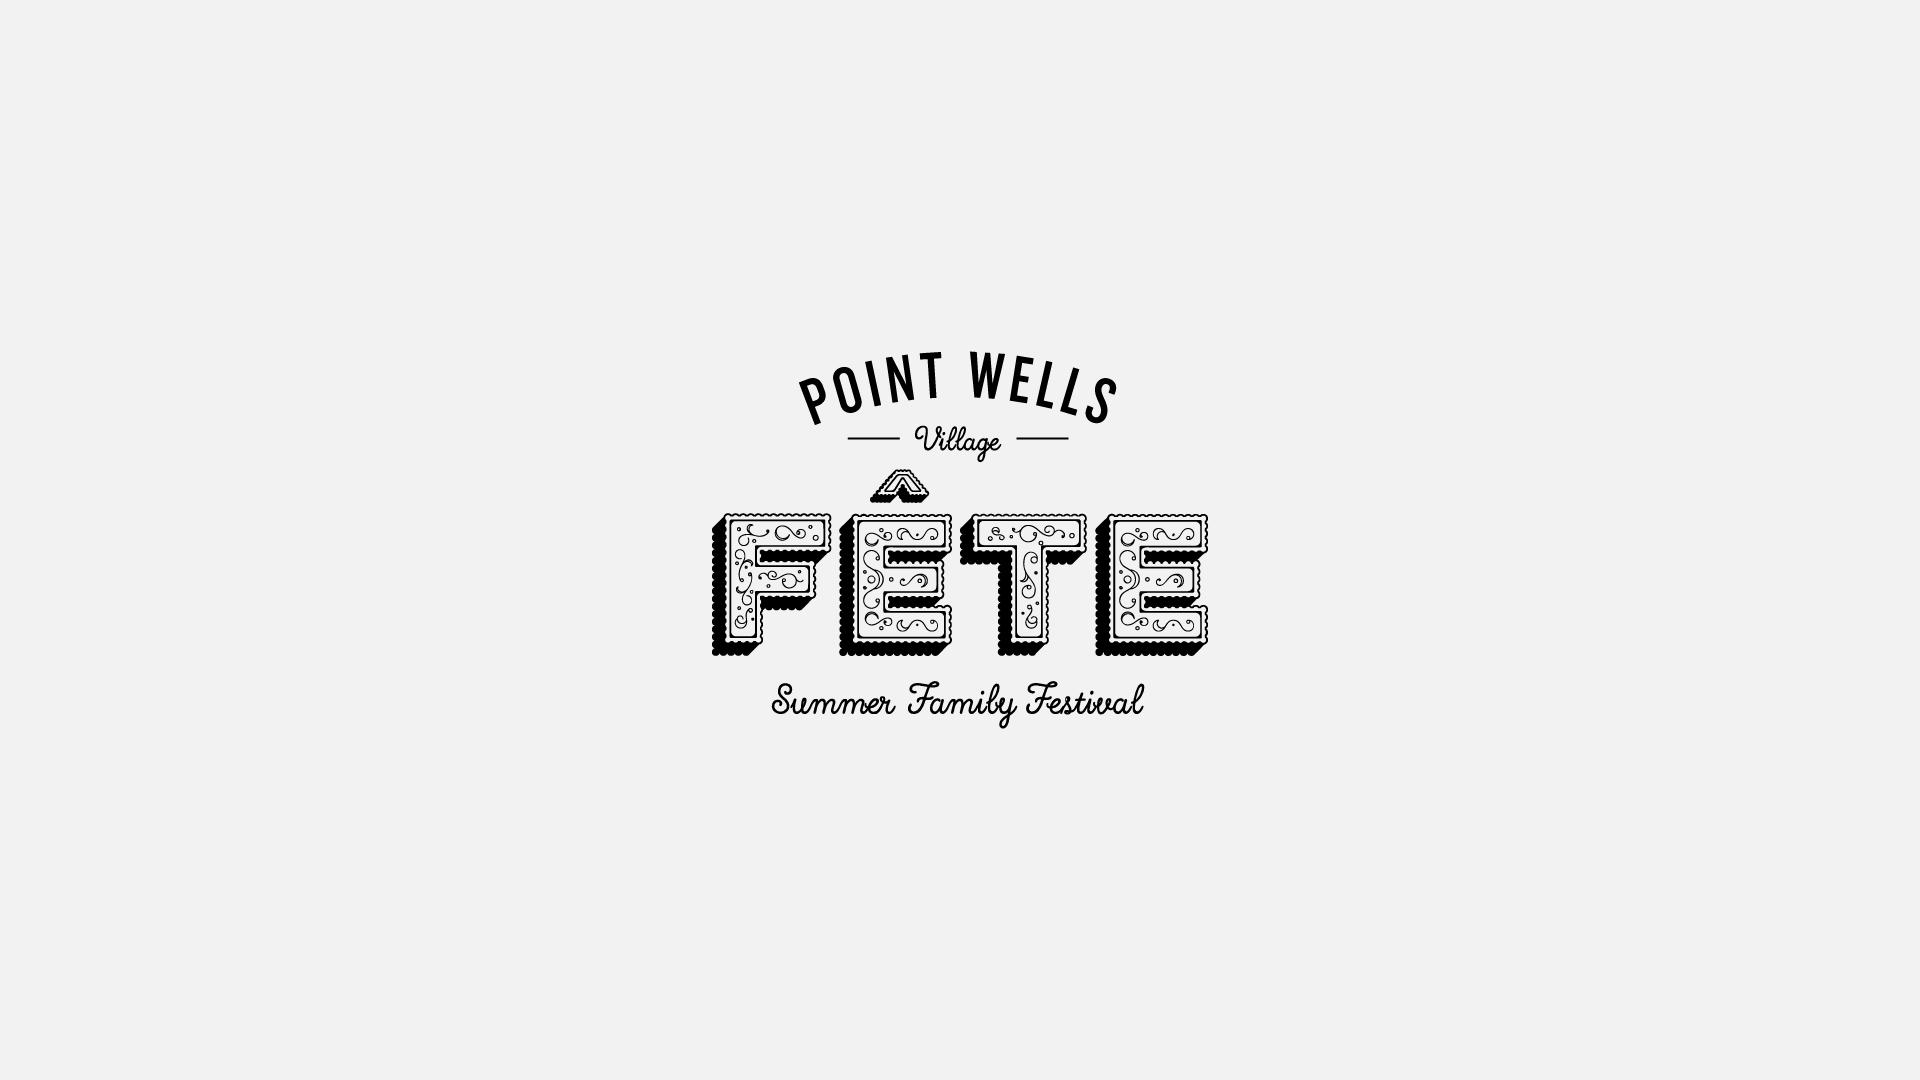 pointwells